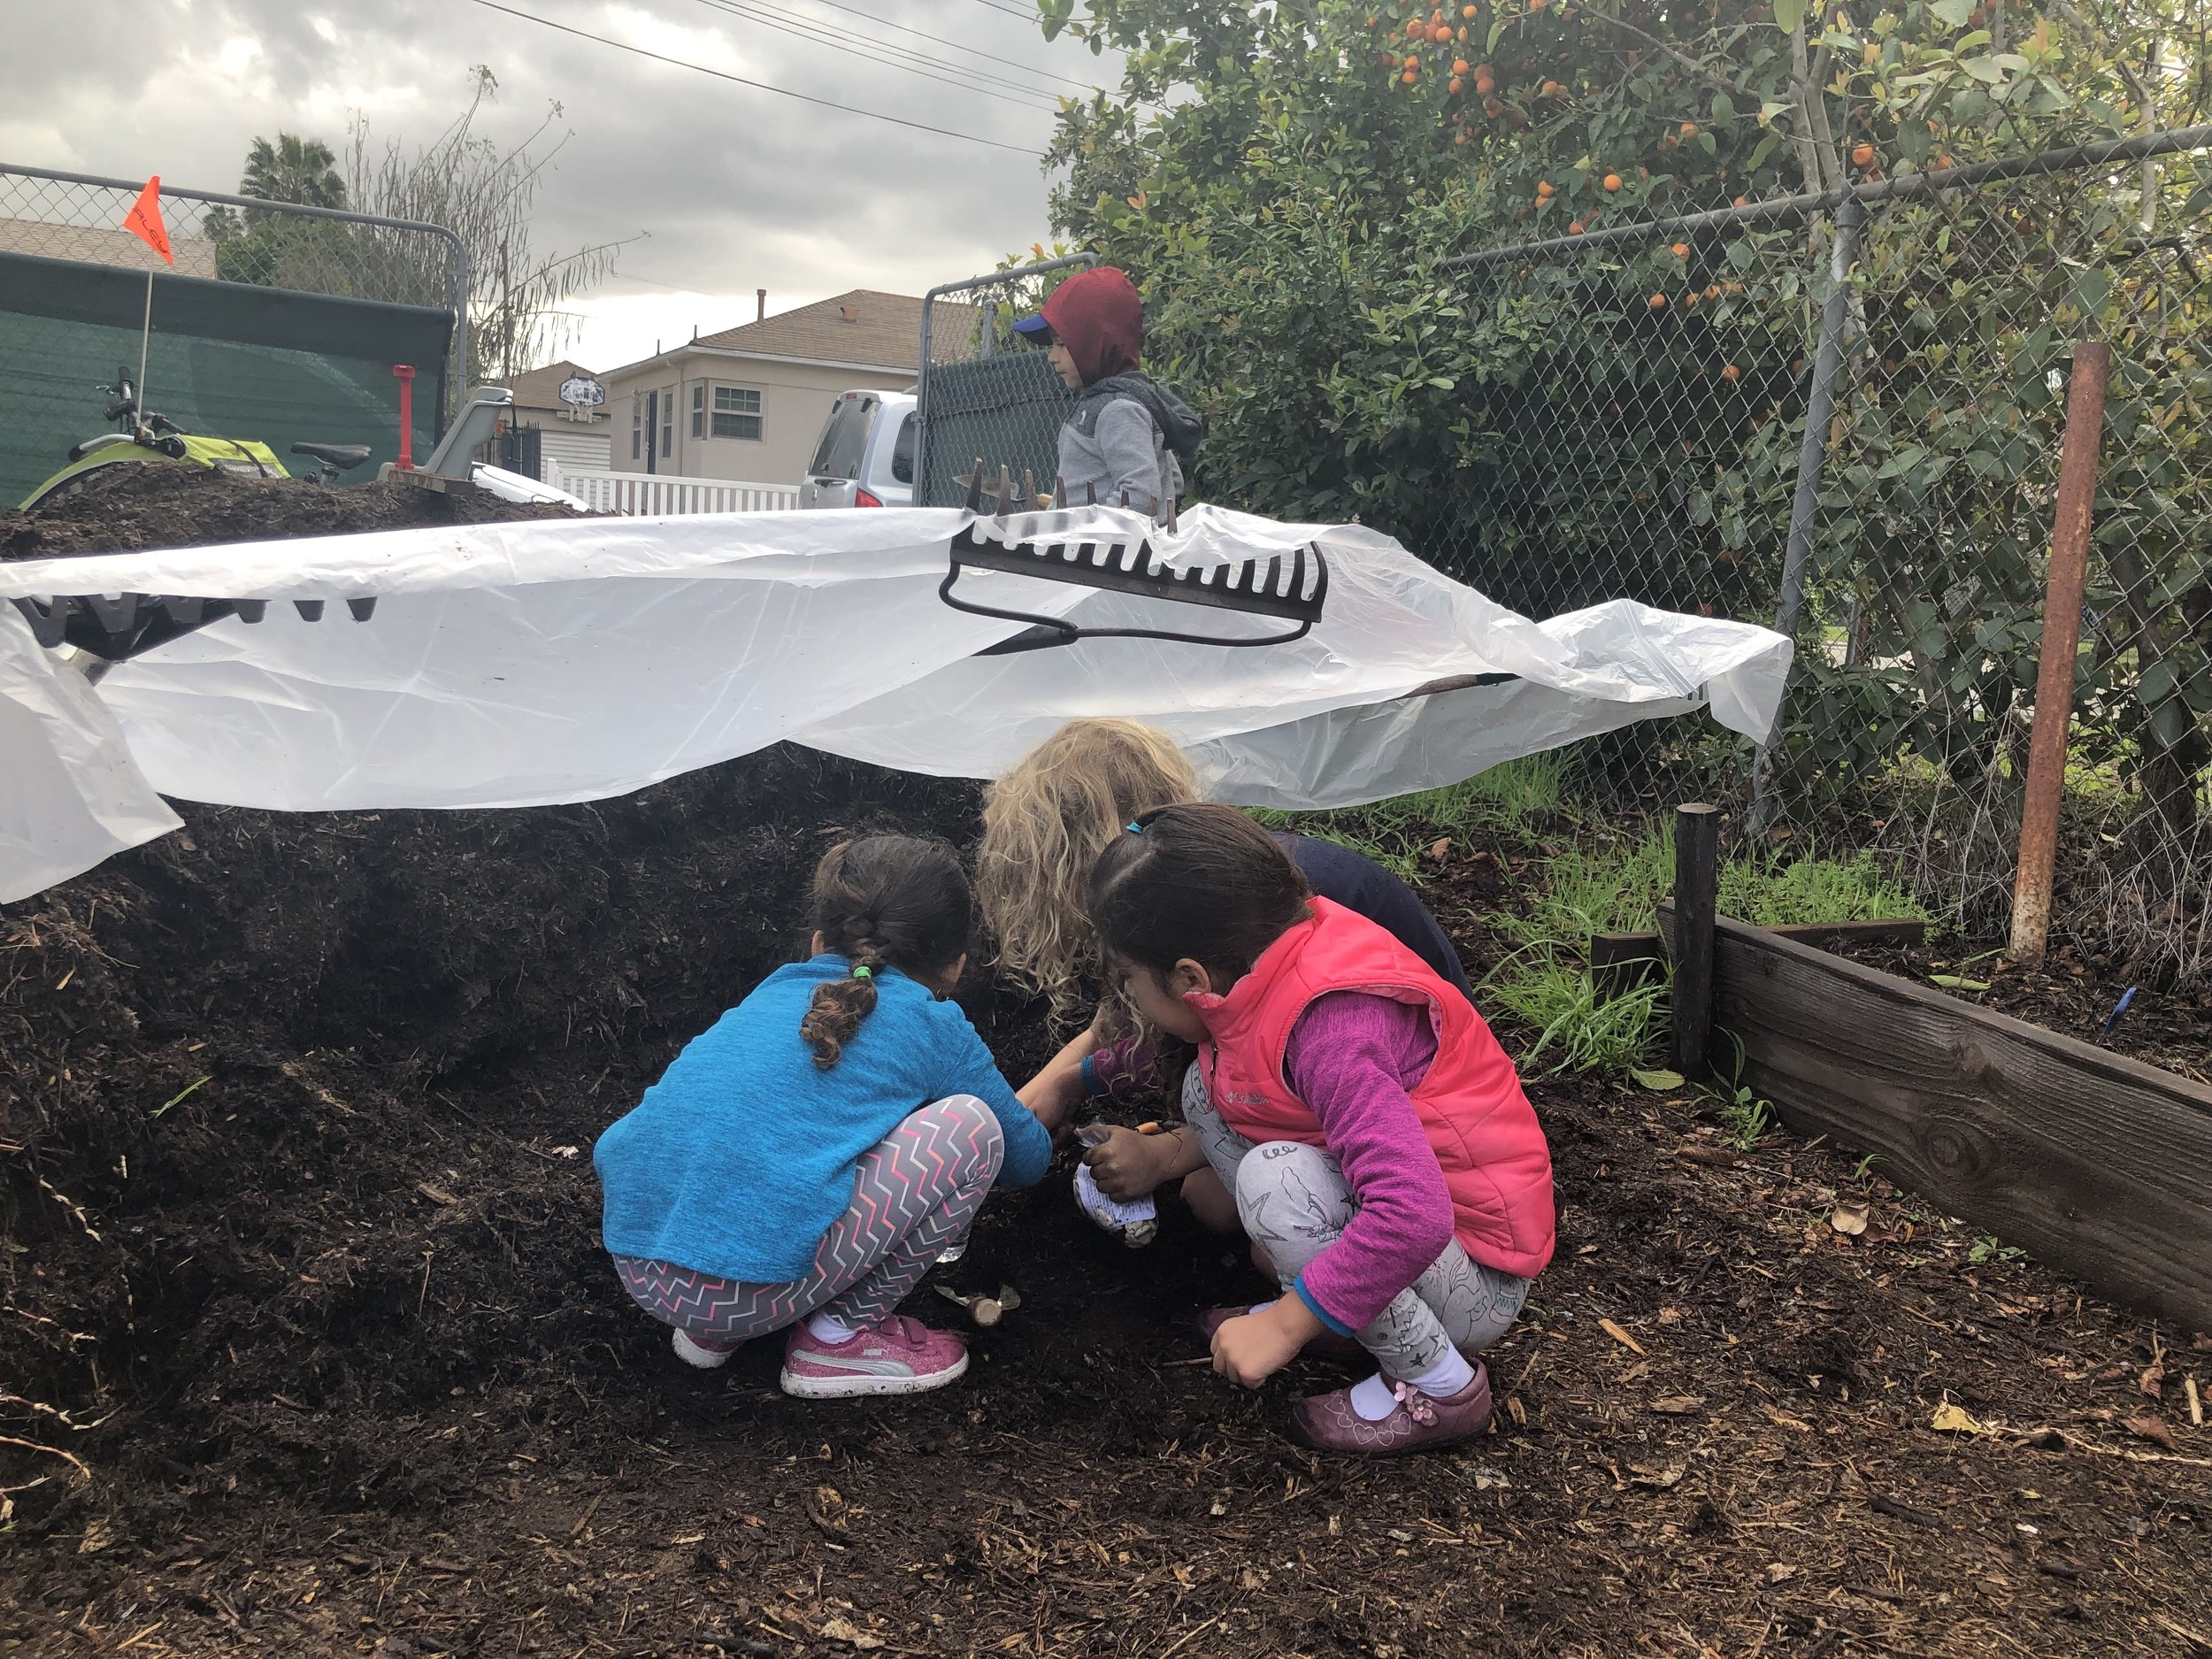 Pop-up rain shelter for kid compost exploration.